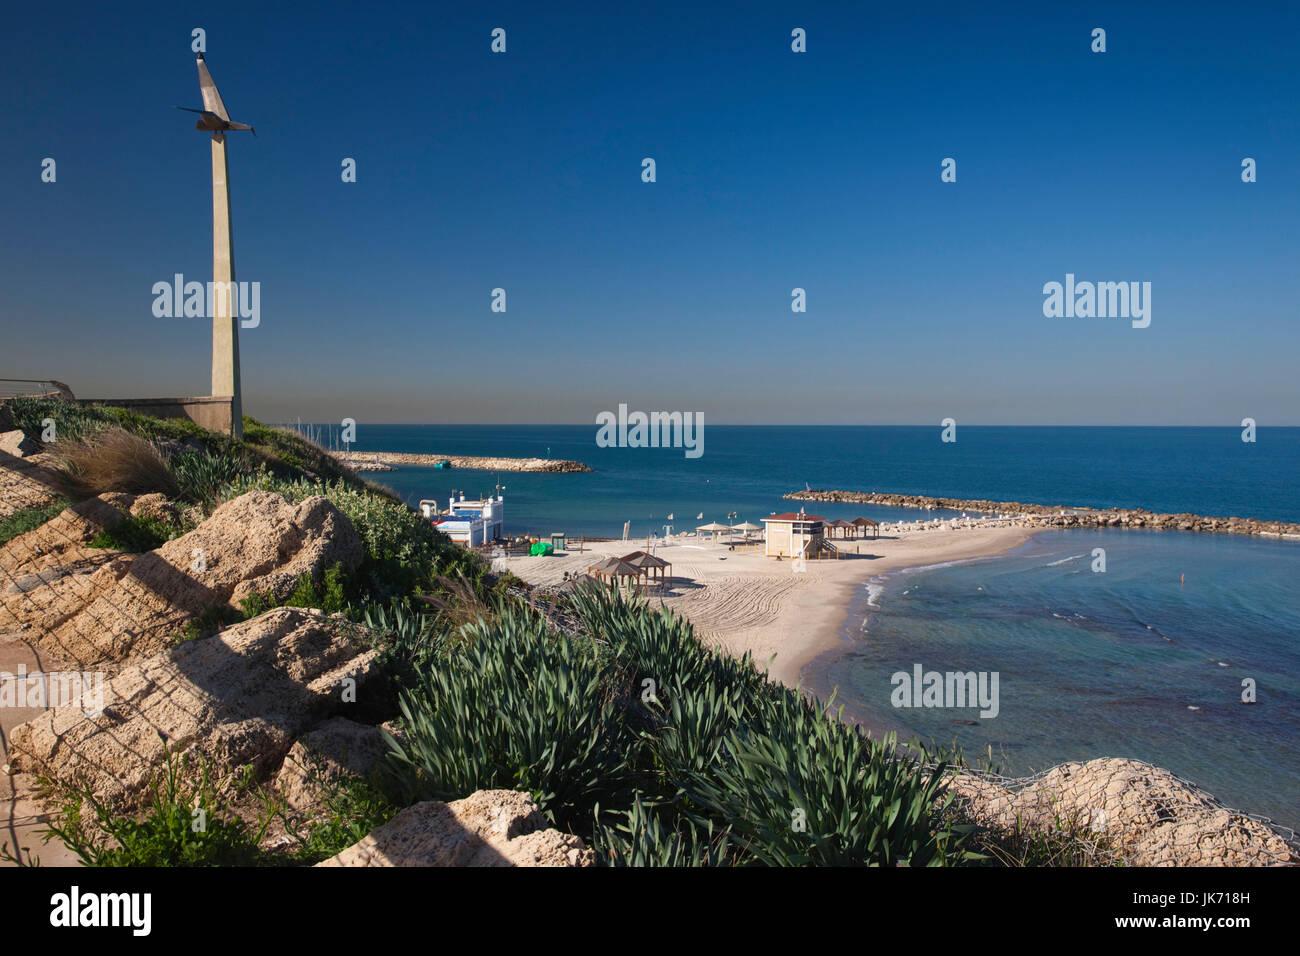 Israel, Tel Aviv, beachfront, Nordau Beach - Stock Image